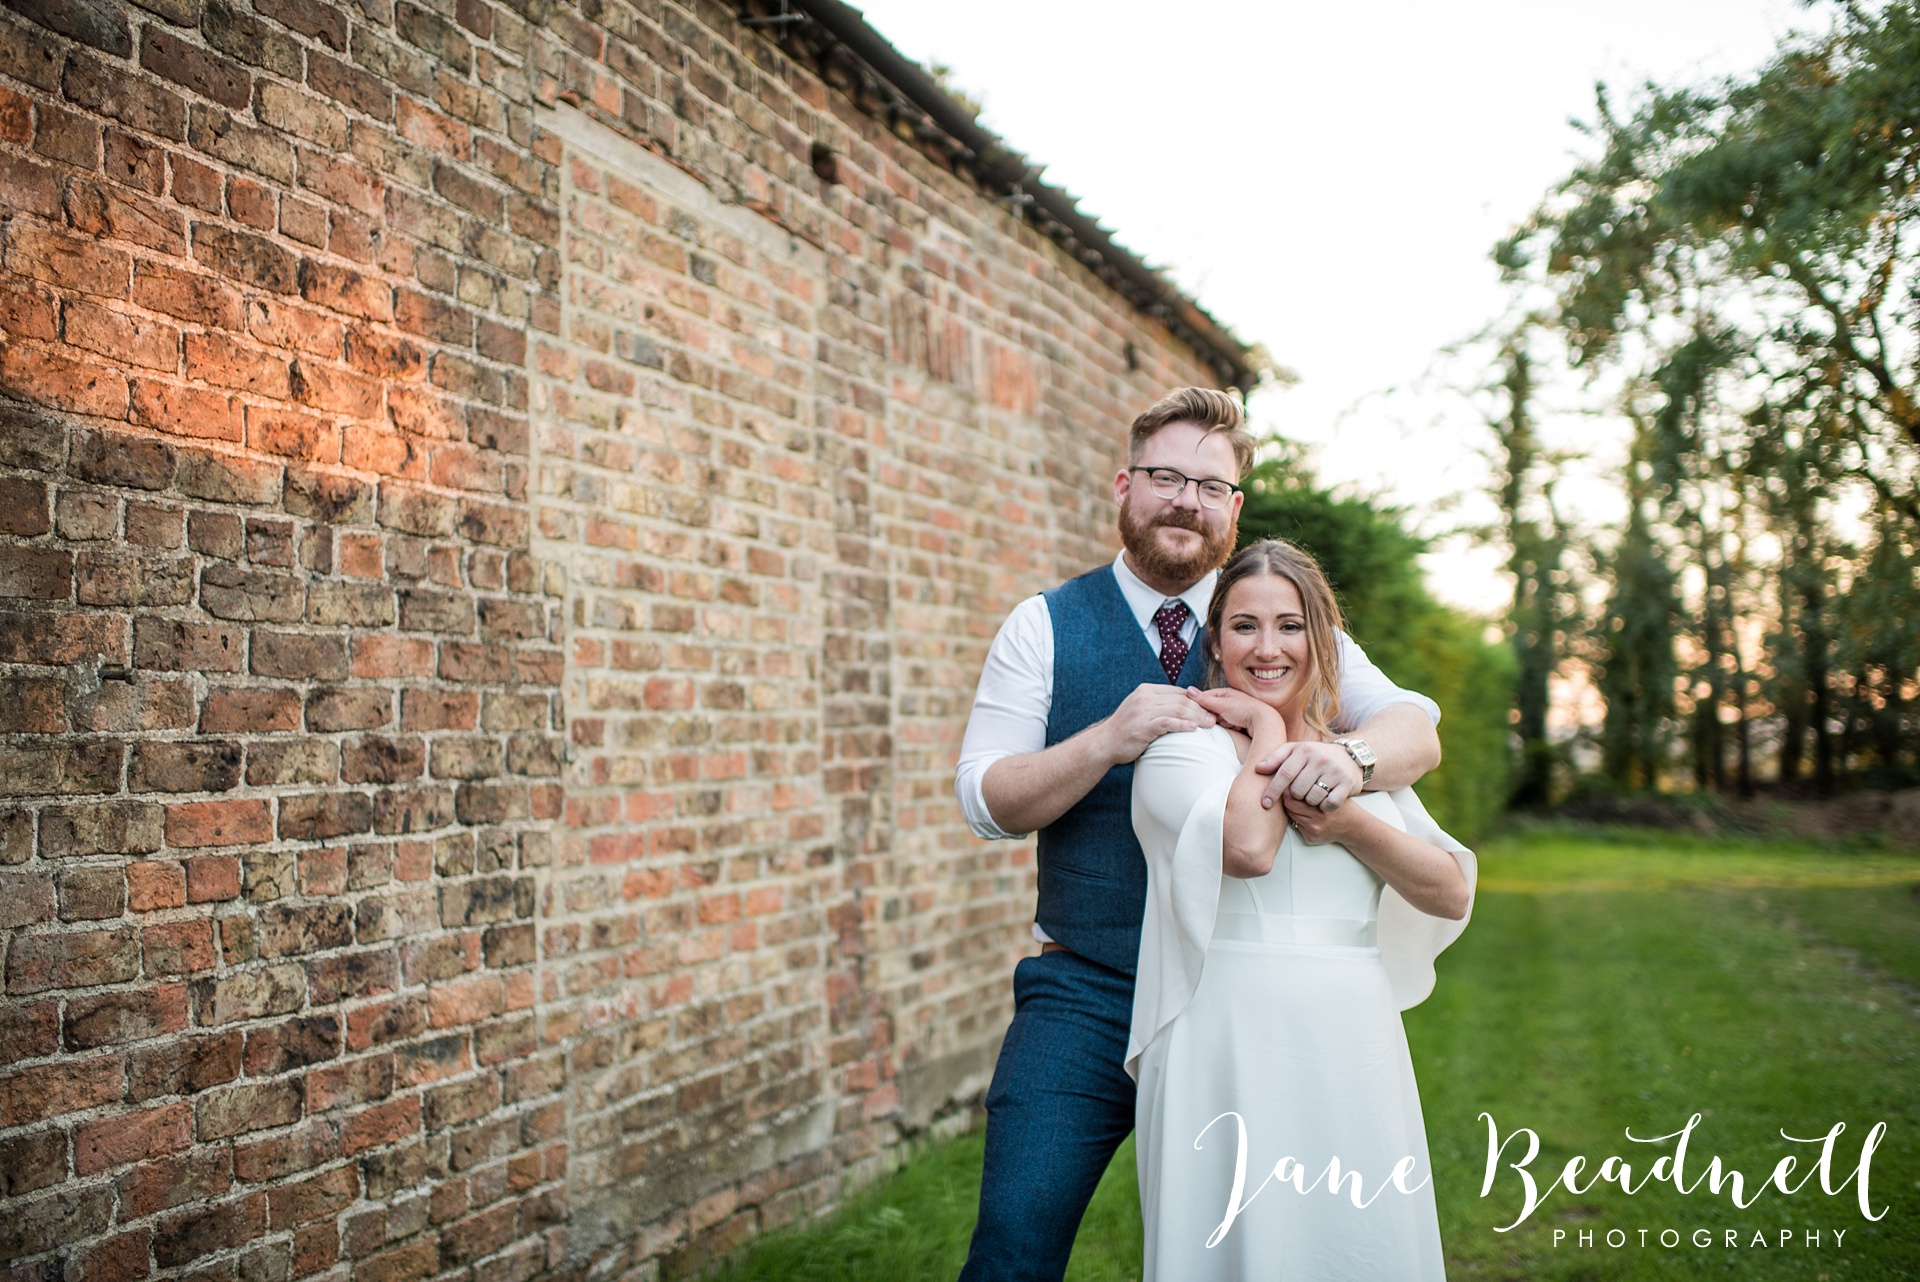 fine-art-wedding-photographer-jane-beadnell-yorkshire-wedding-photographer-garden-wedding_0150